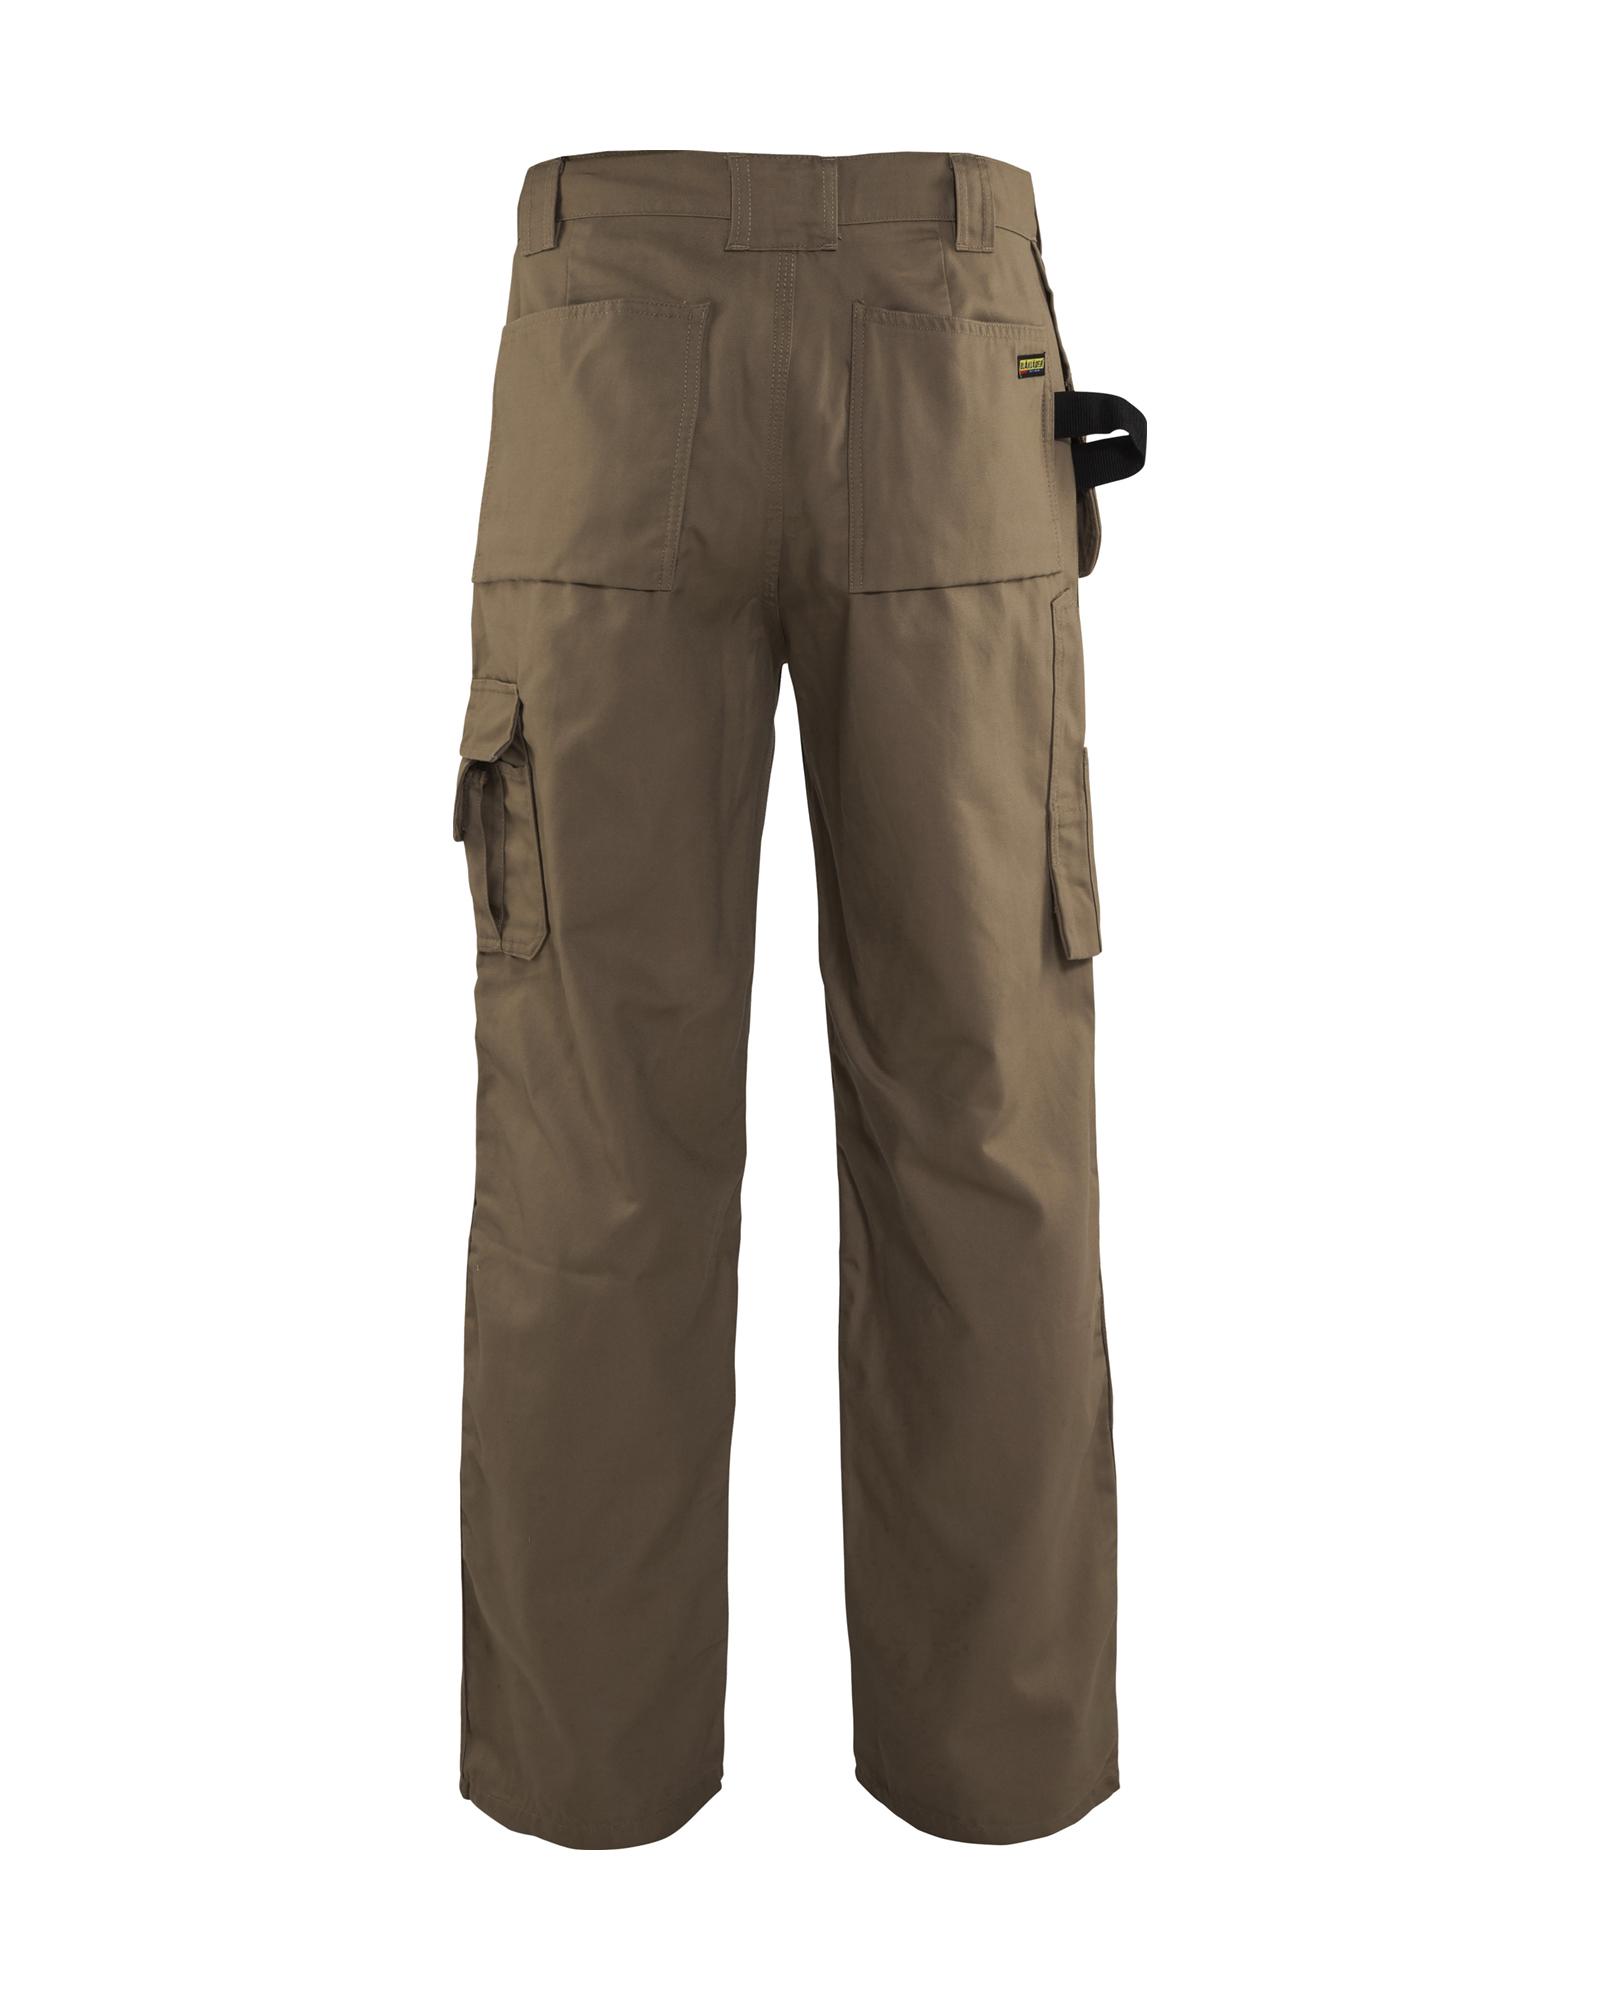 8-Ounce Cotton 30-Inch Length Khaki 38-Inch Waist Blaklader Workwear Bantam Pant with Utility Pockets